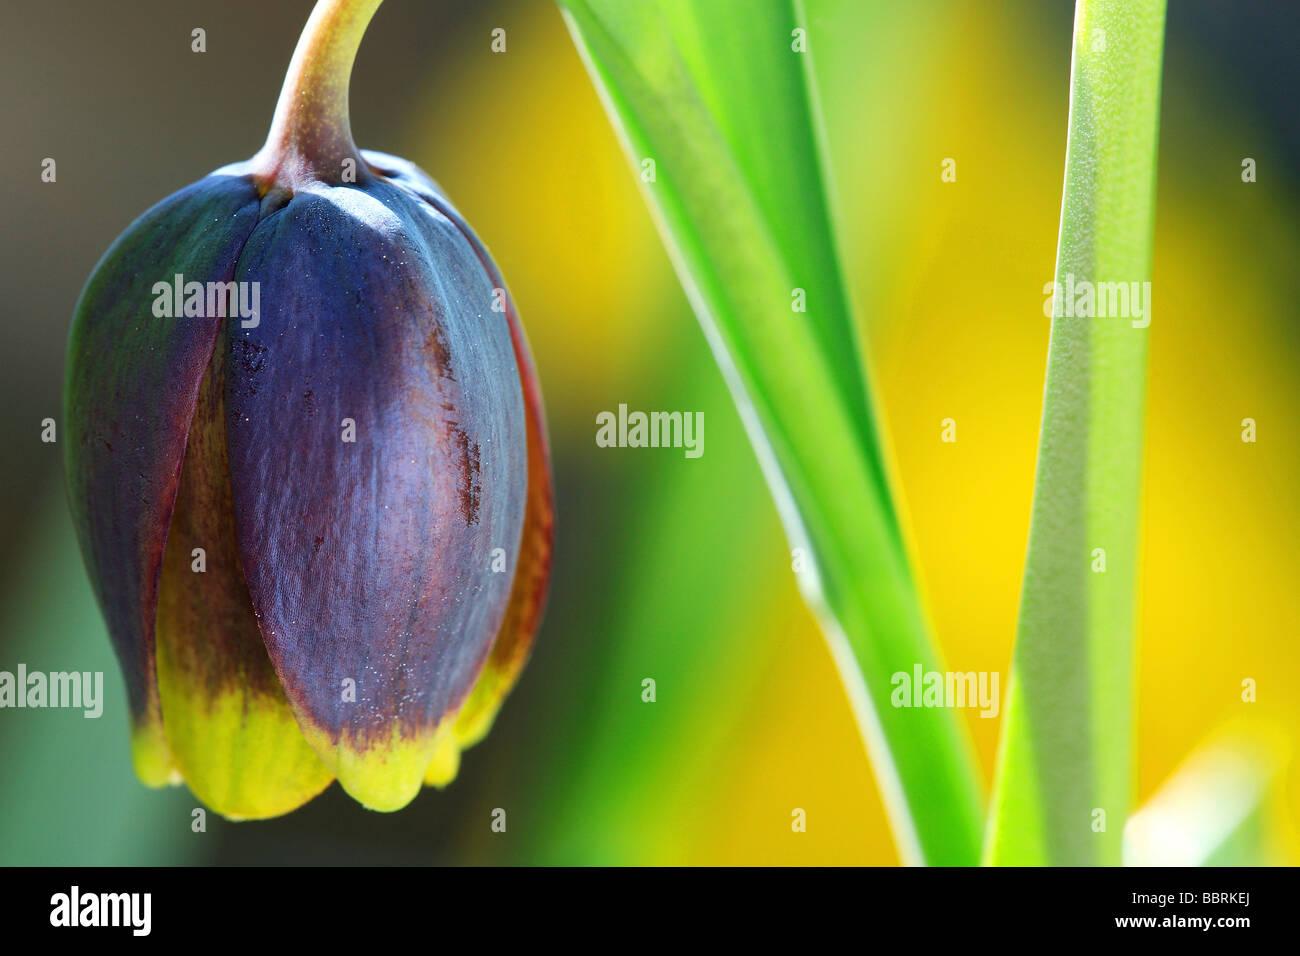 Fritillaria uva vulpis Fritillary uva vulpis flower Glasshouse England Spring - Stock Image